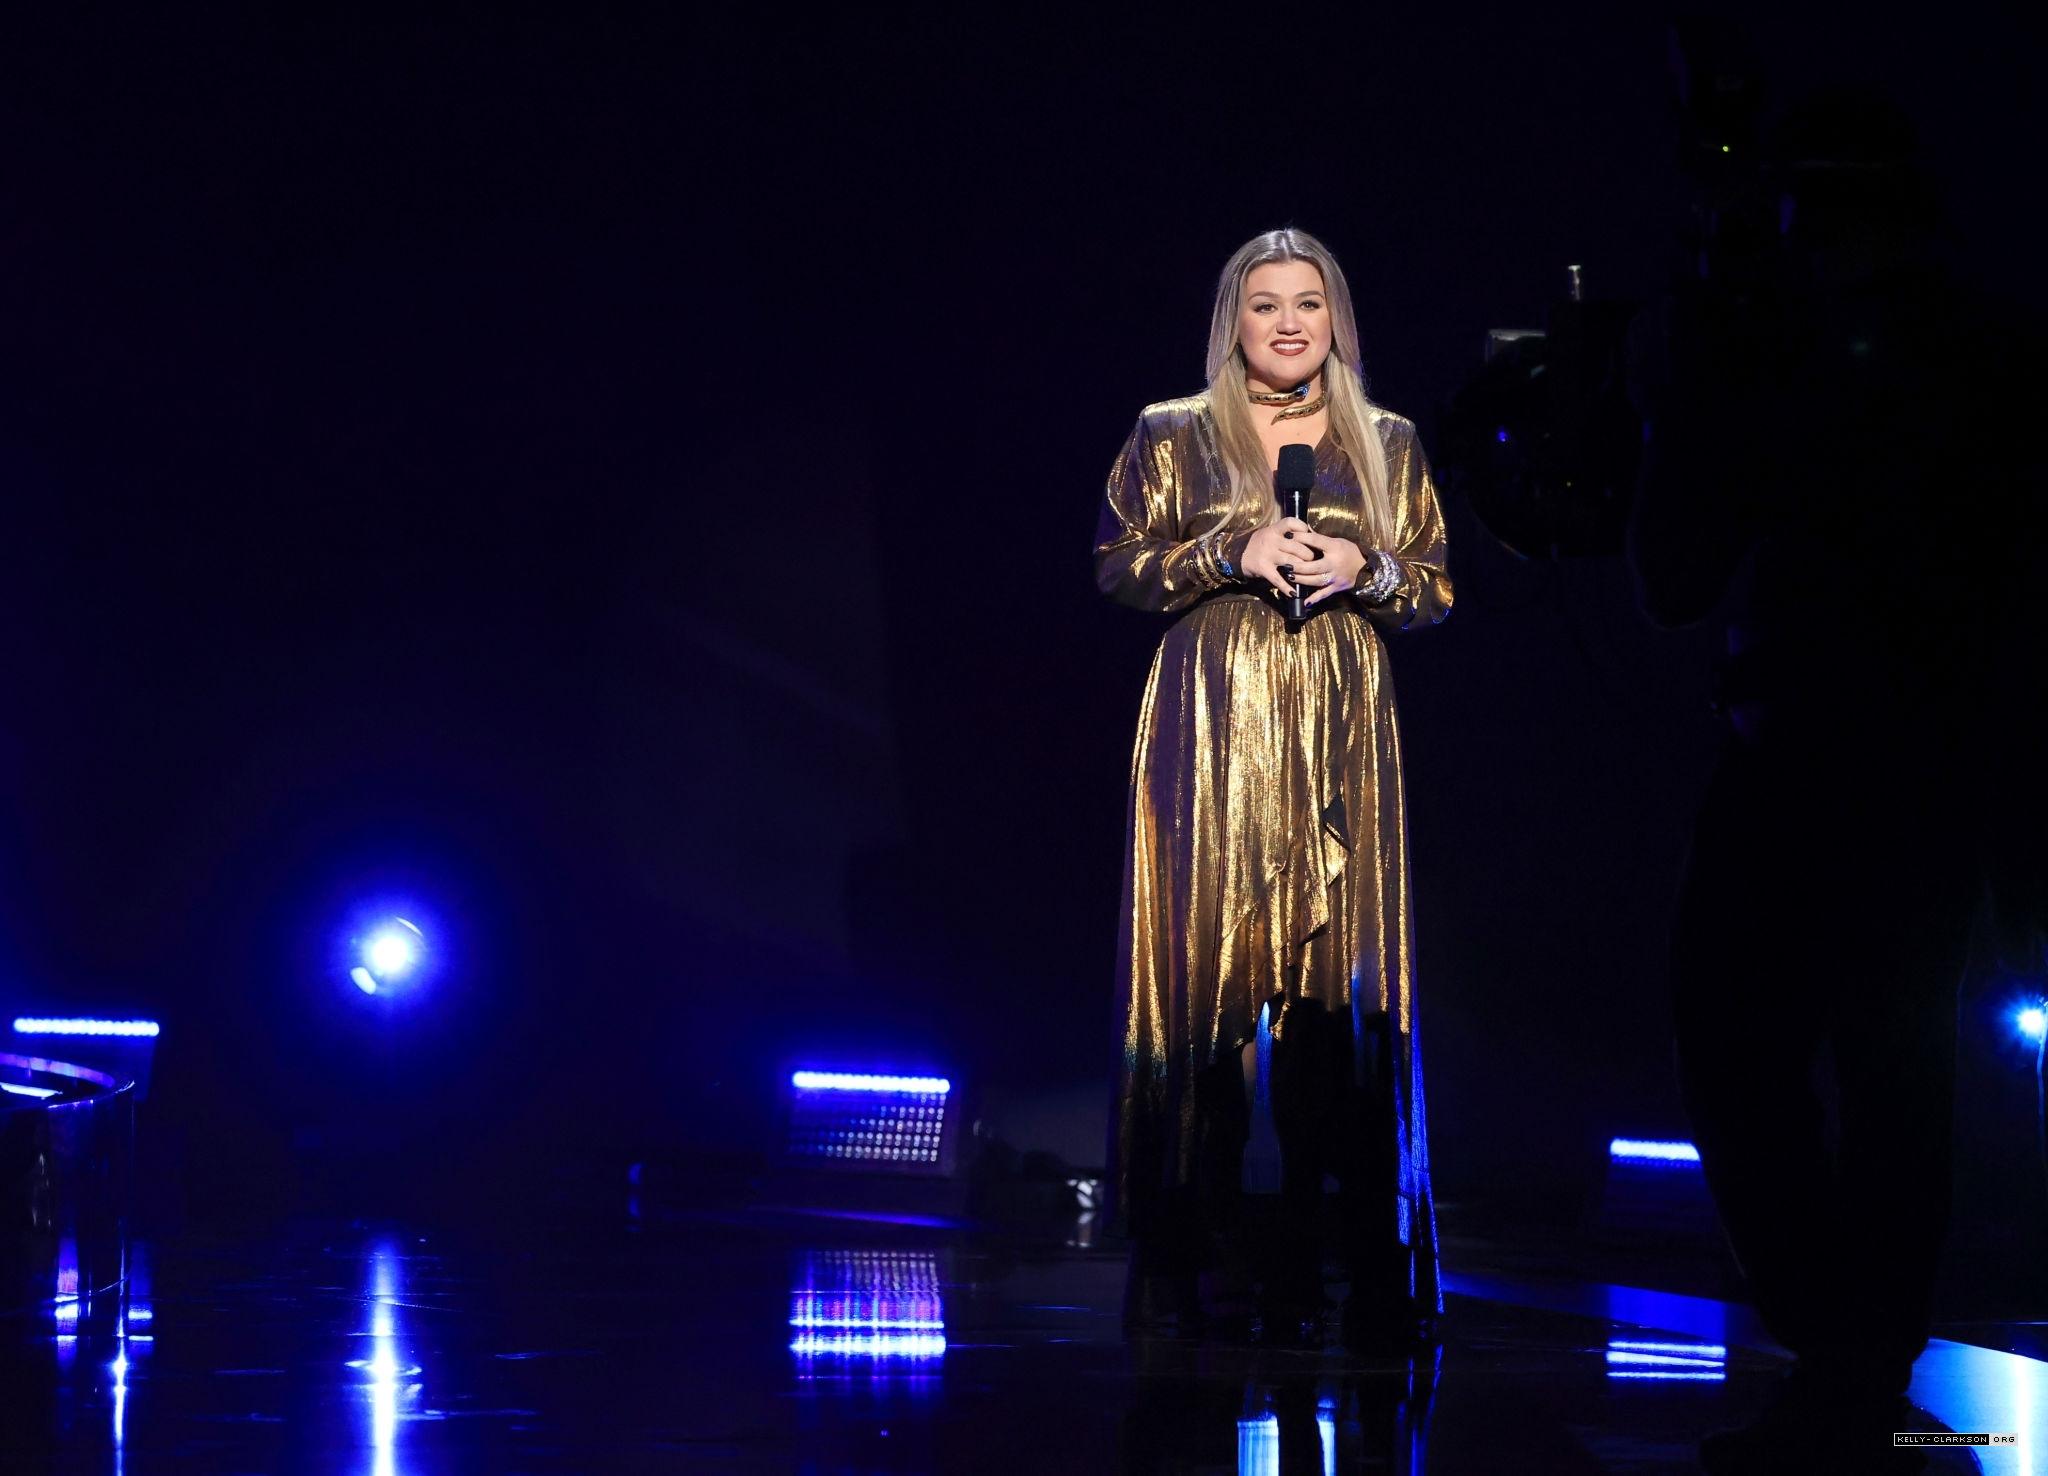 kelly-clarkson-in-retrofete-hosting-the-2020-billboard-music-awards